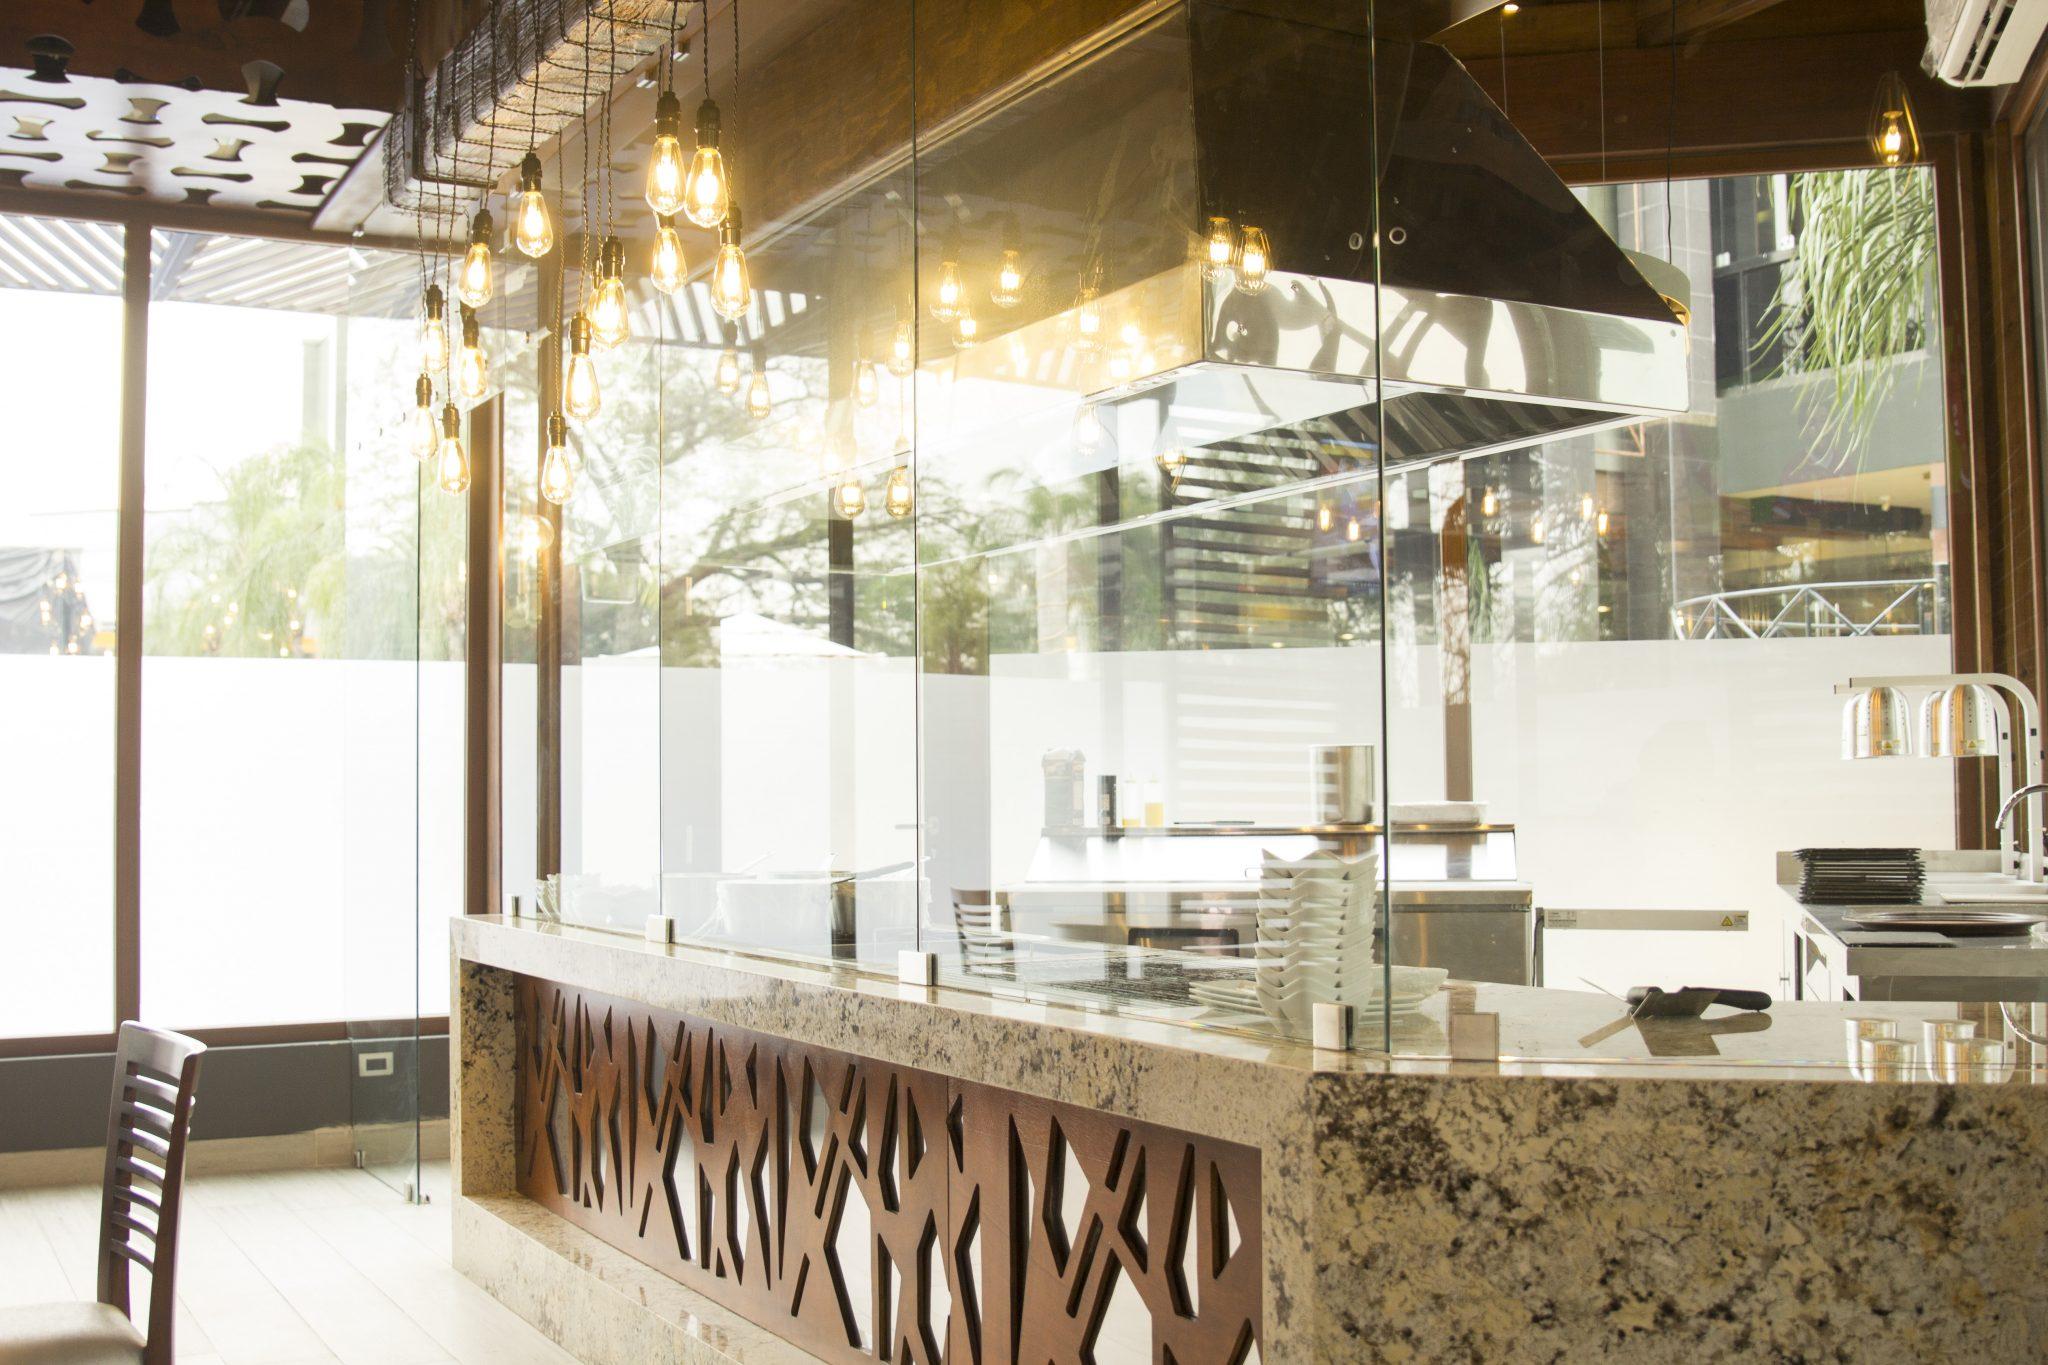 Meza 23, el restaurante sensación de Honduras - Iconos Magazine ...